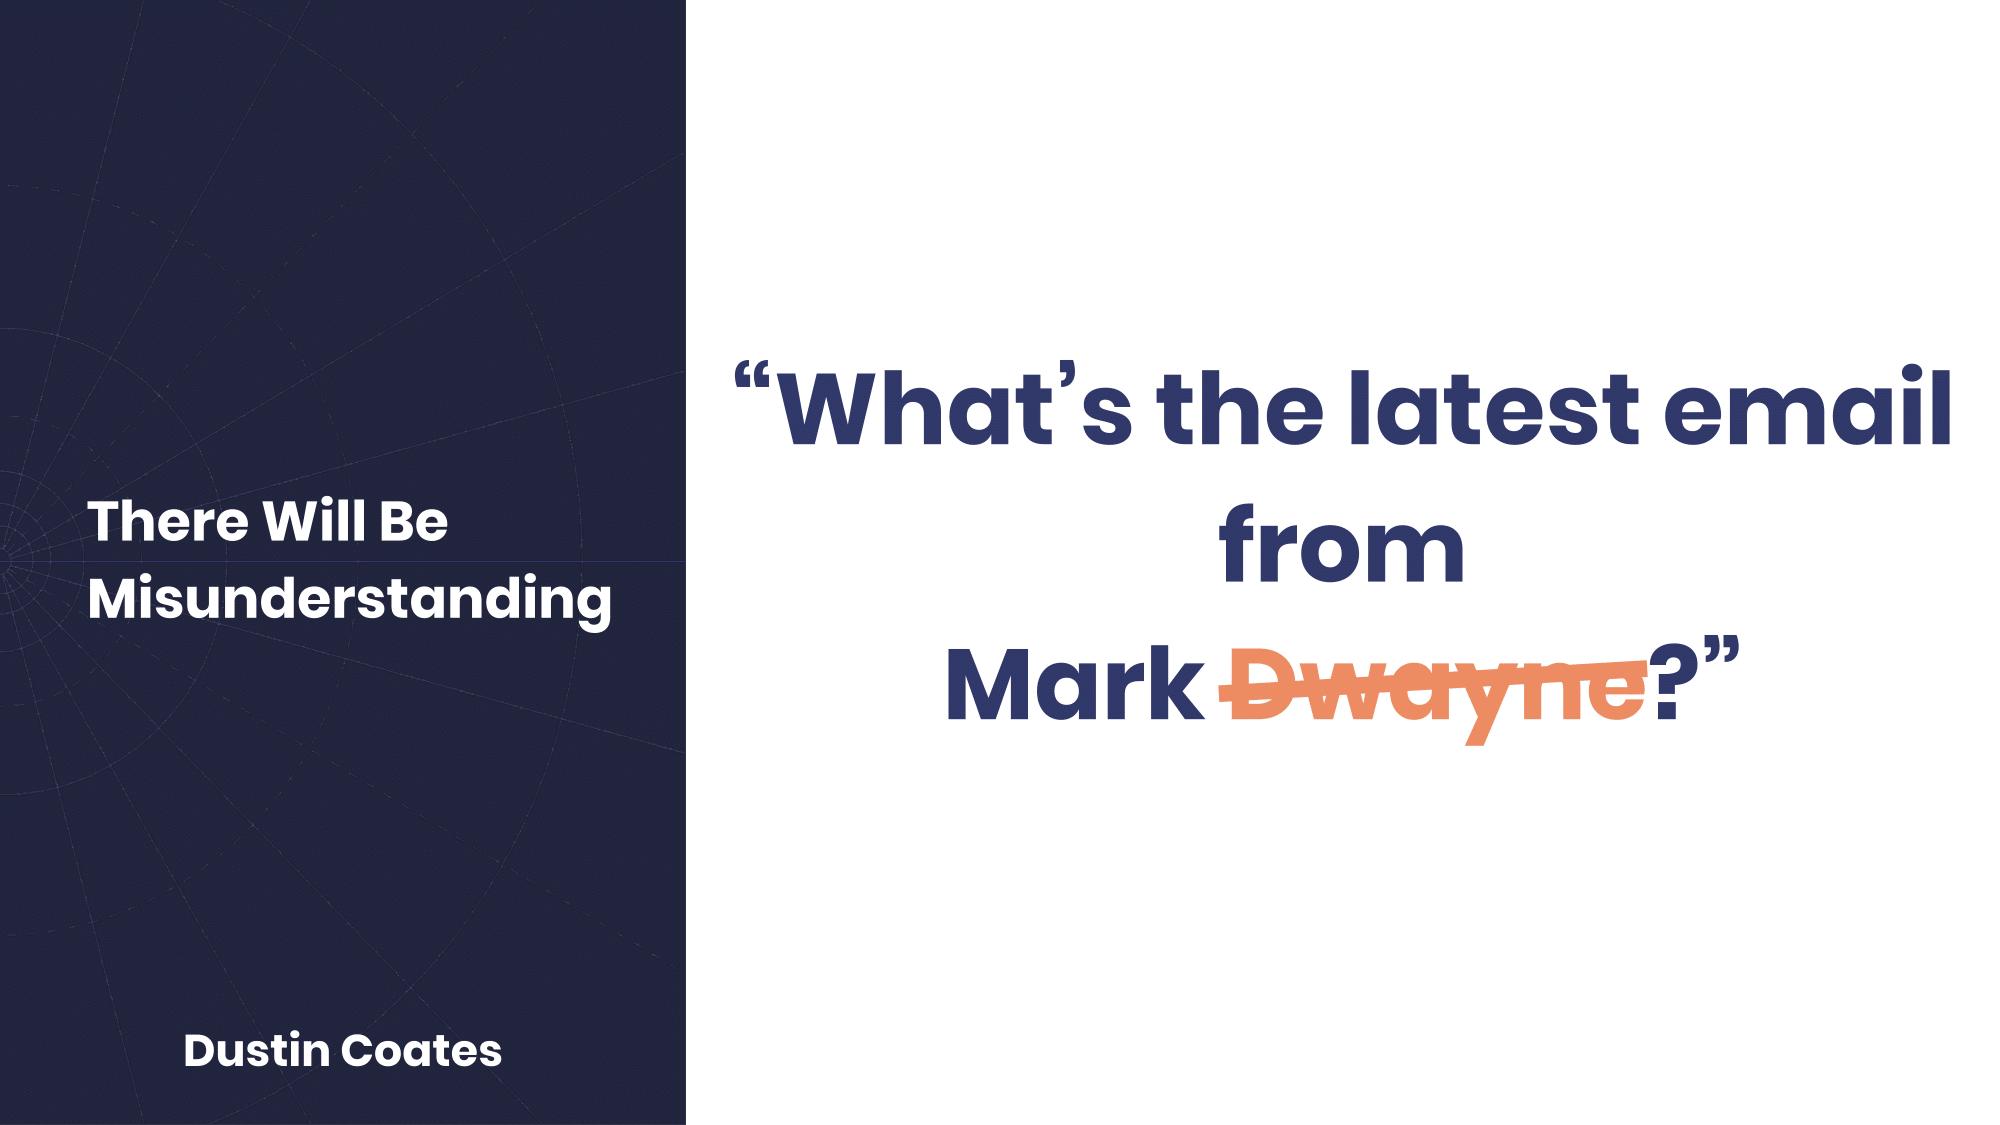 Mark Dwayne understood as Mark Twain